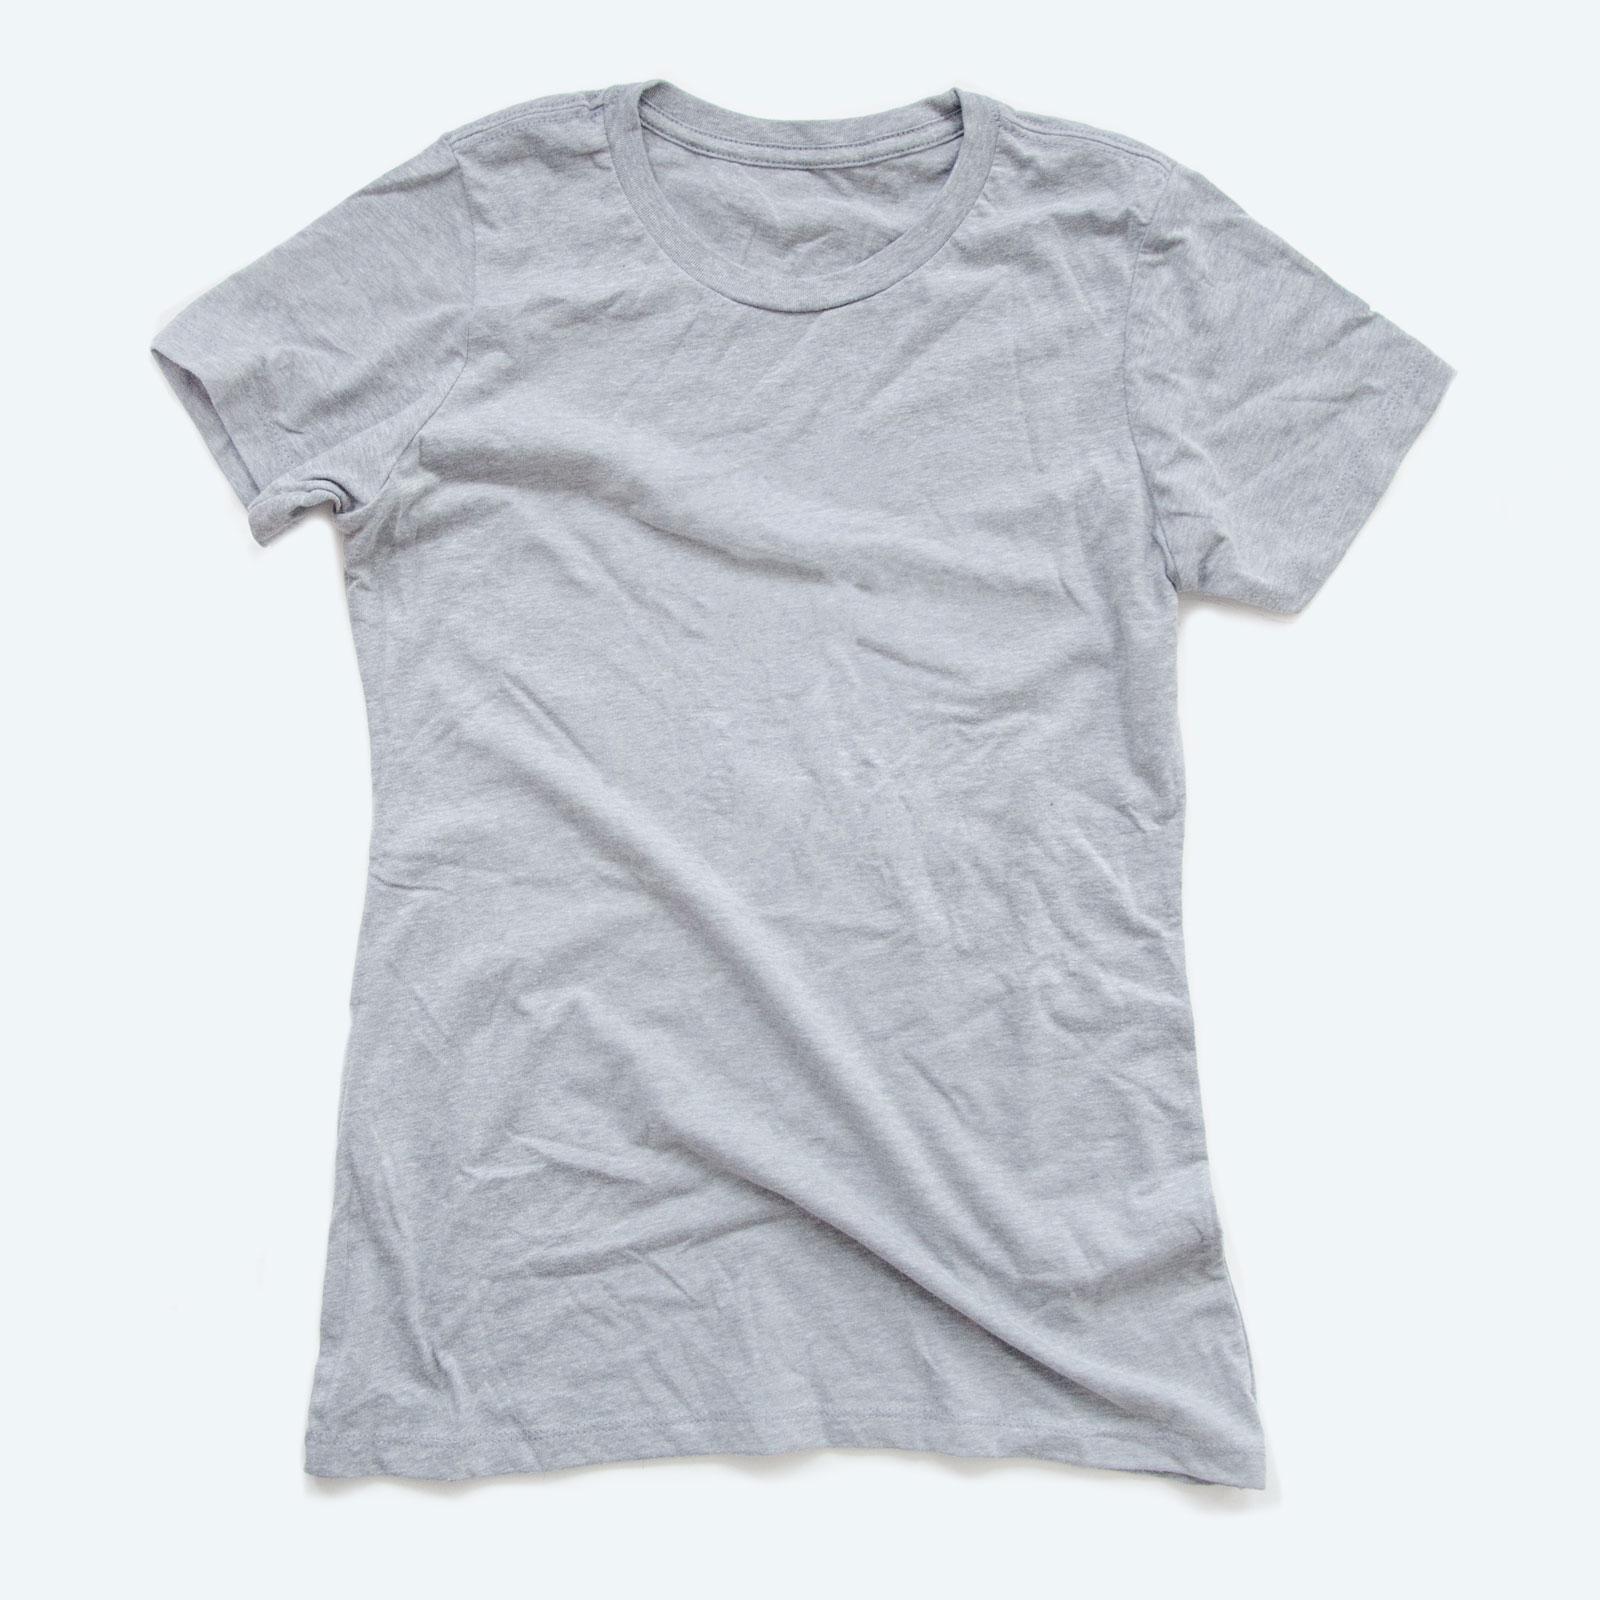 Sell custom women's slim fit  shirts online.